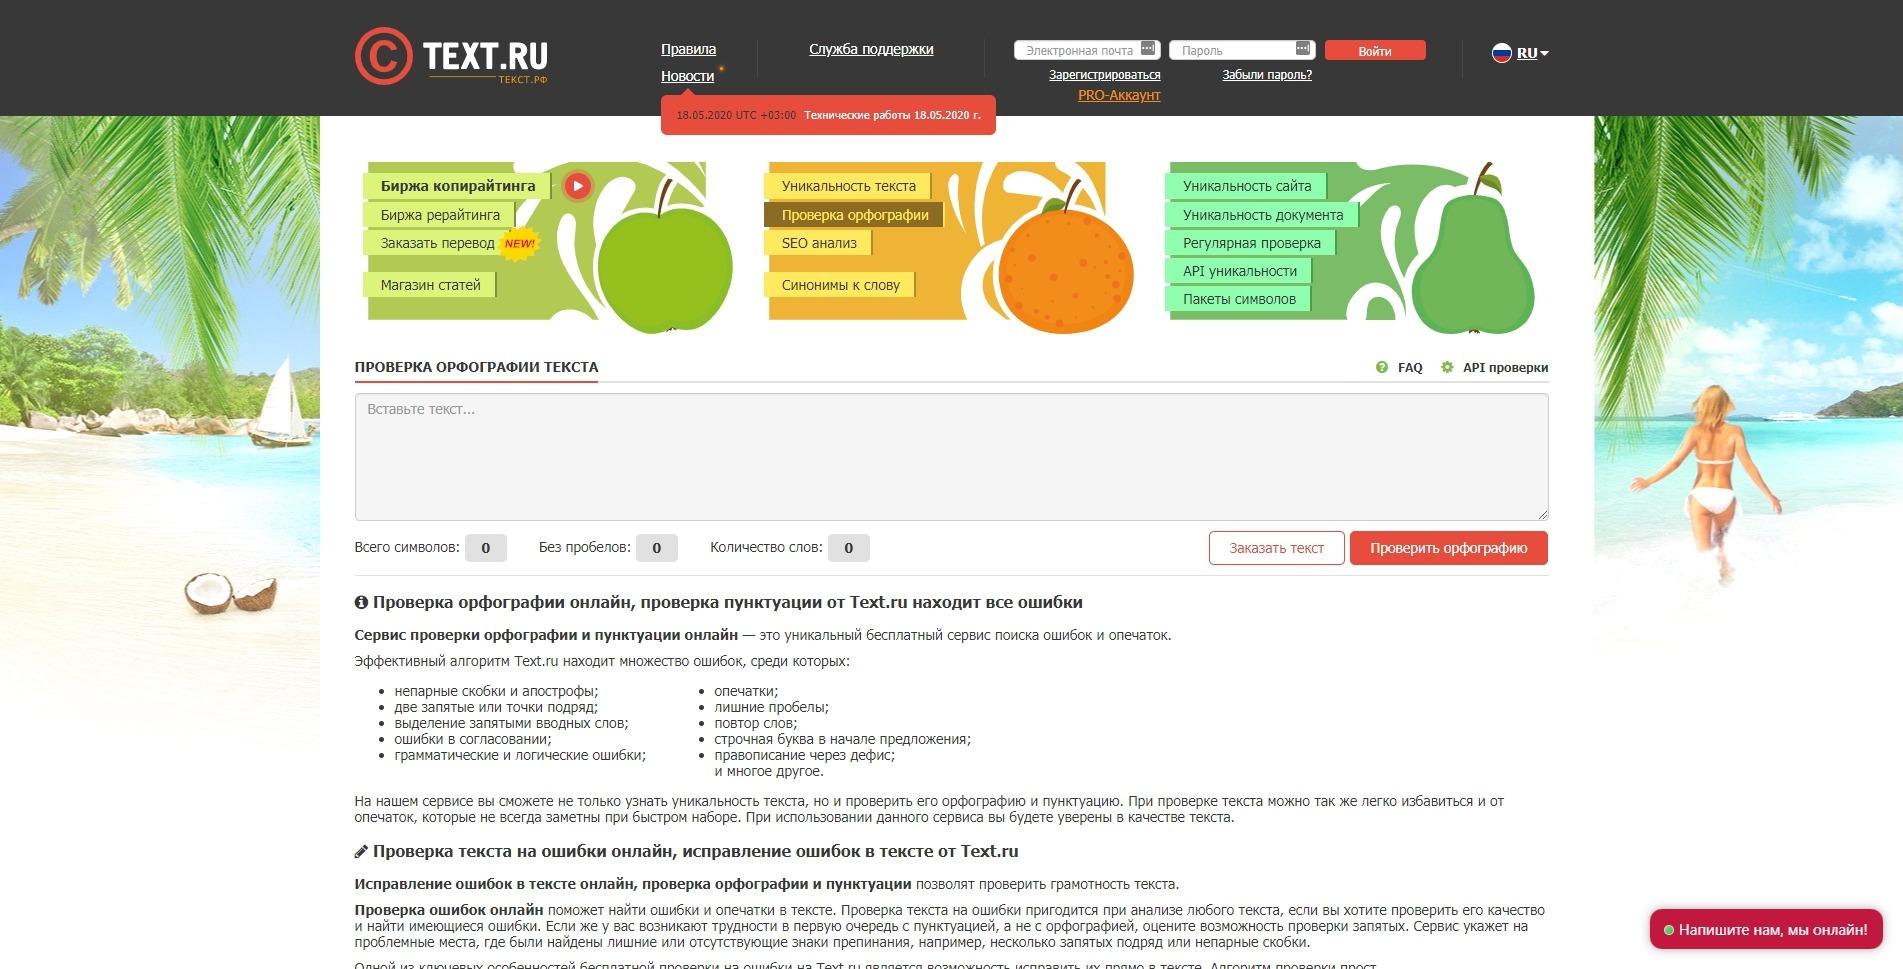 Проверка орфографии онлайн: Text.ru